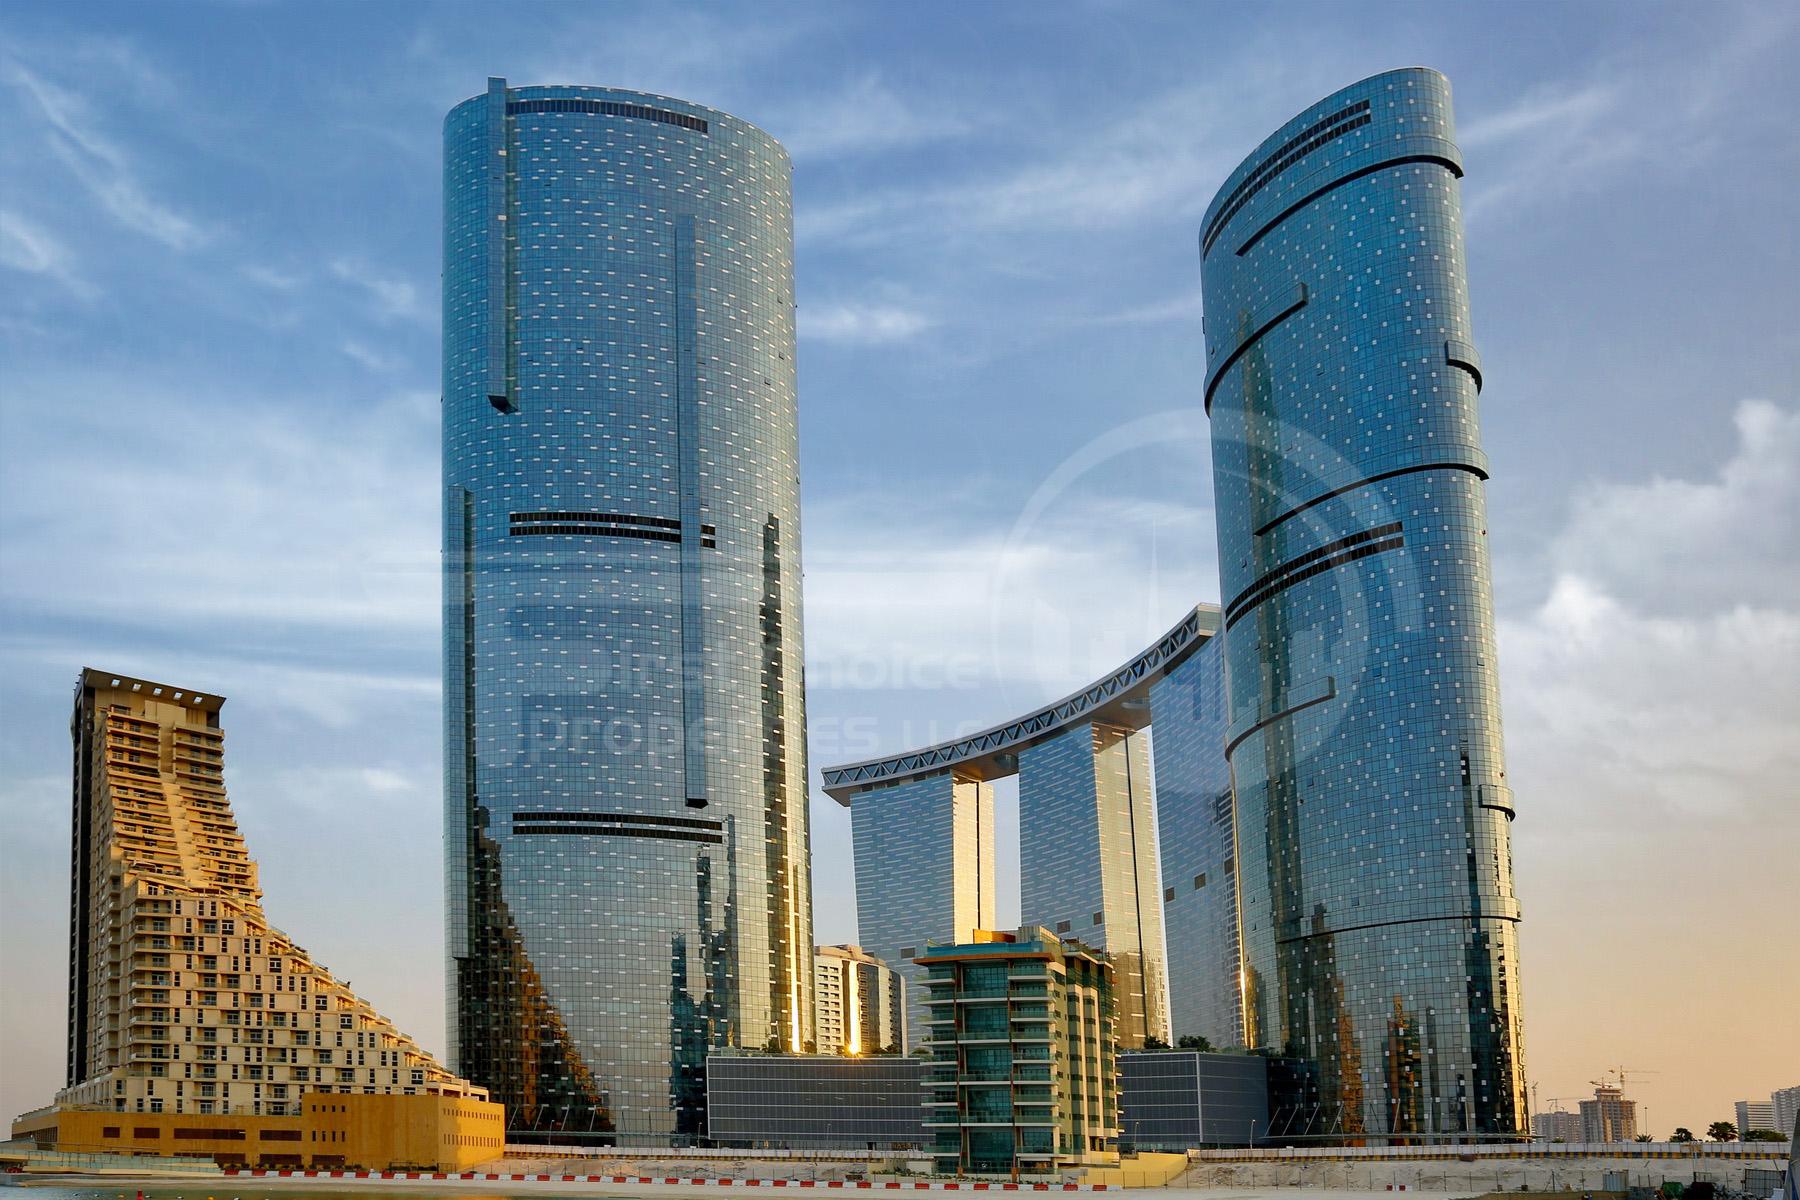 Studio - 1BR - 2BR - 3BR - 4BR Apartment - Abu Dhabi - UAE - Al Reem Island - Sun and  Sky Tower - Outside View (38).JPG